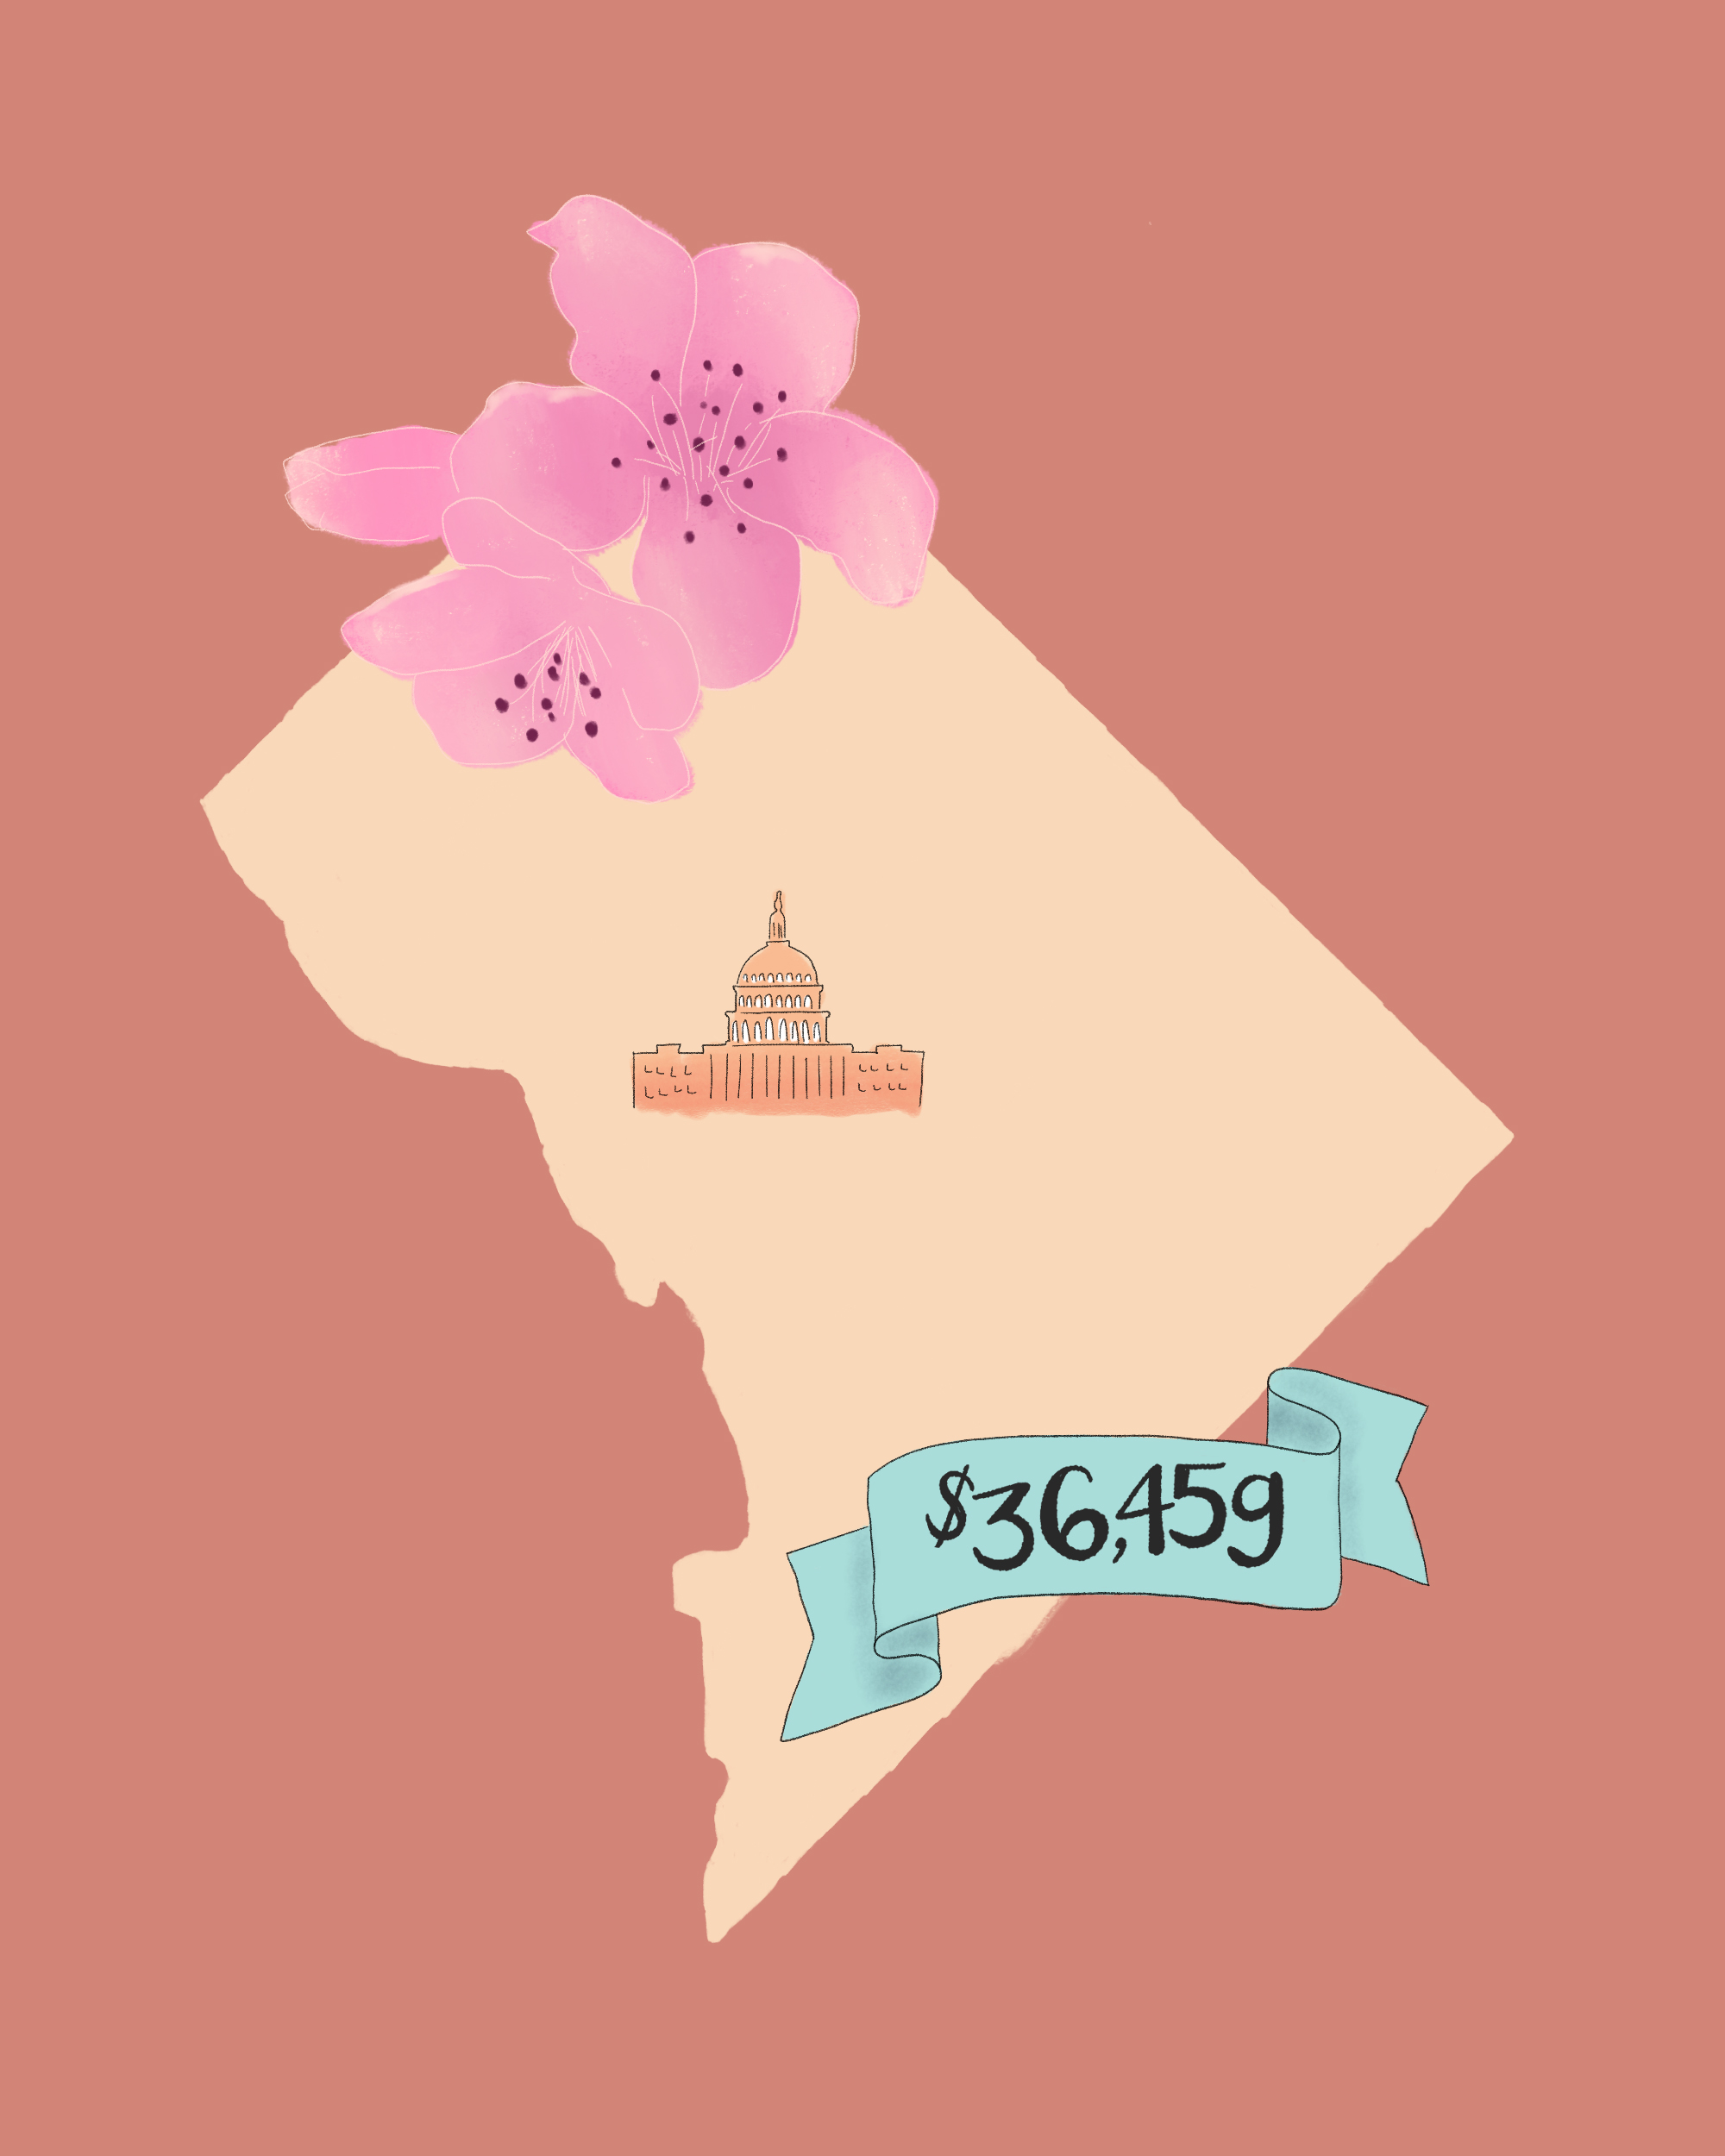 state wedding costs illustration washington dc